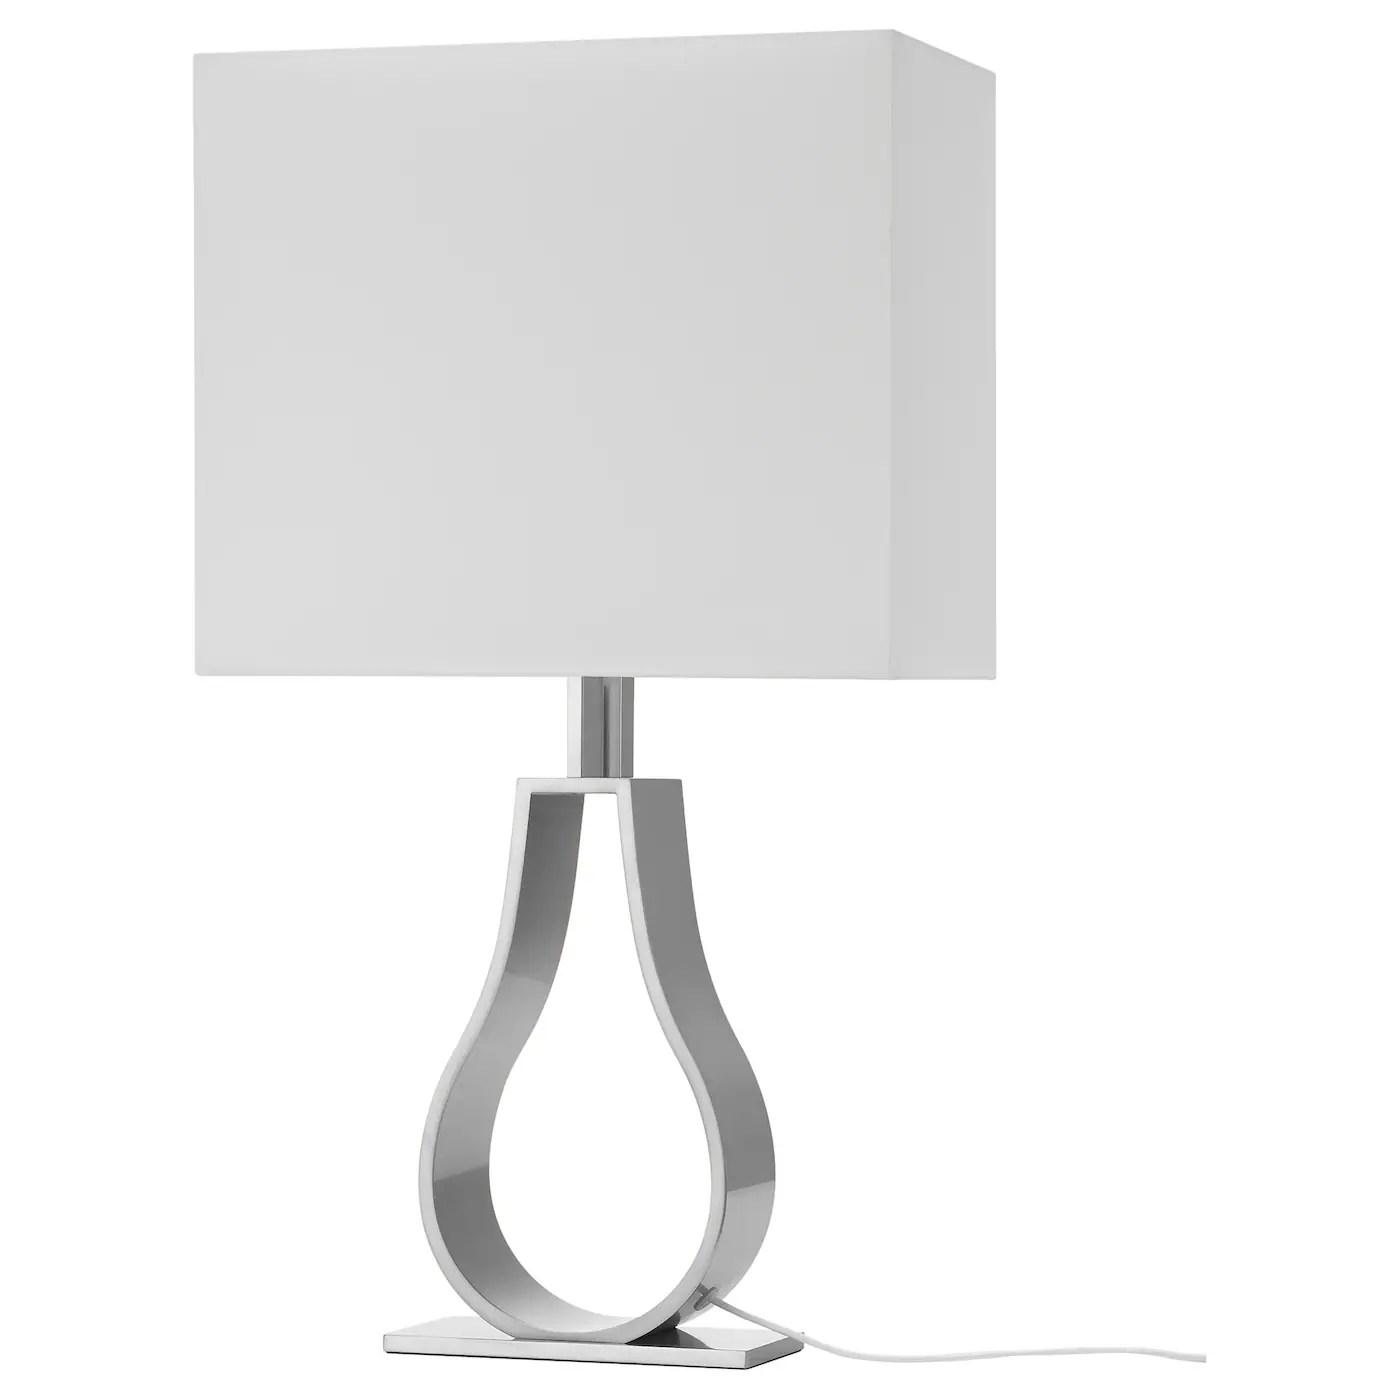 klabb lampe de table blanc casse nickele 60 cm